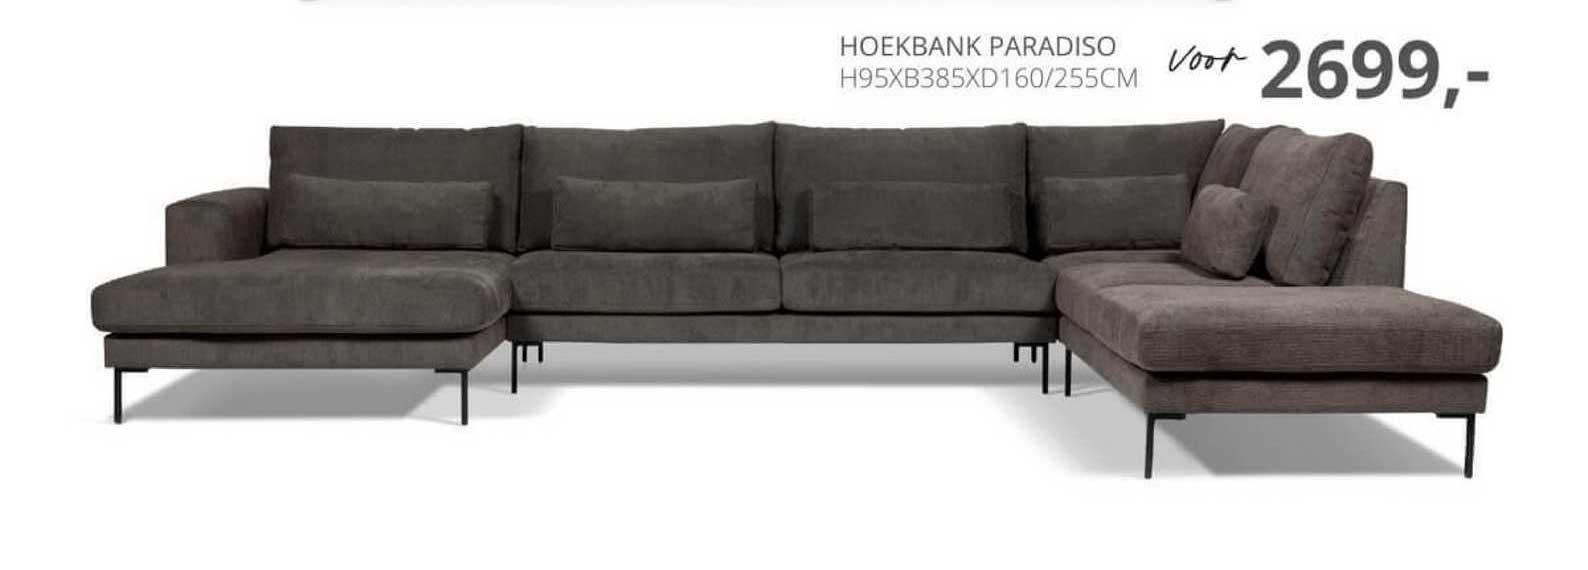 De Bommel Meubelen Hoekbank Paradiso H95xB385xD160-255cm